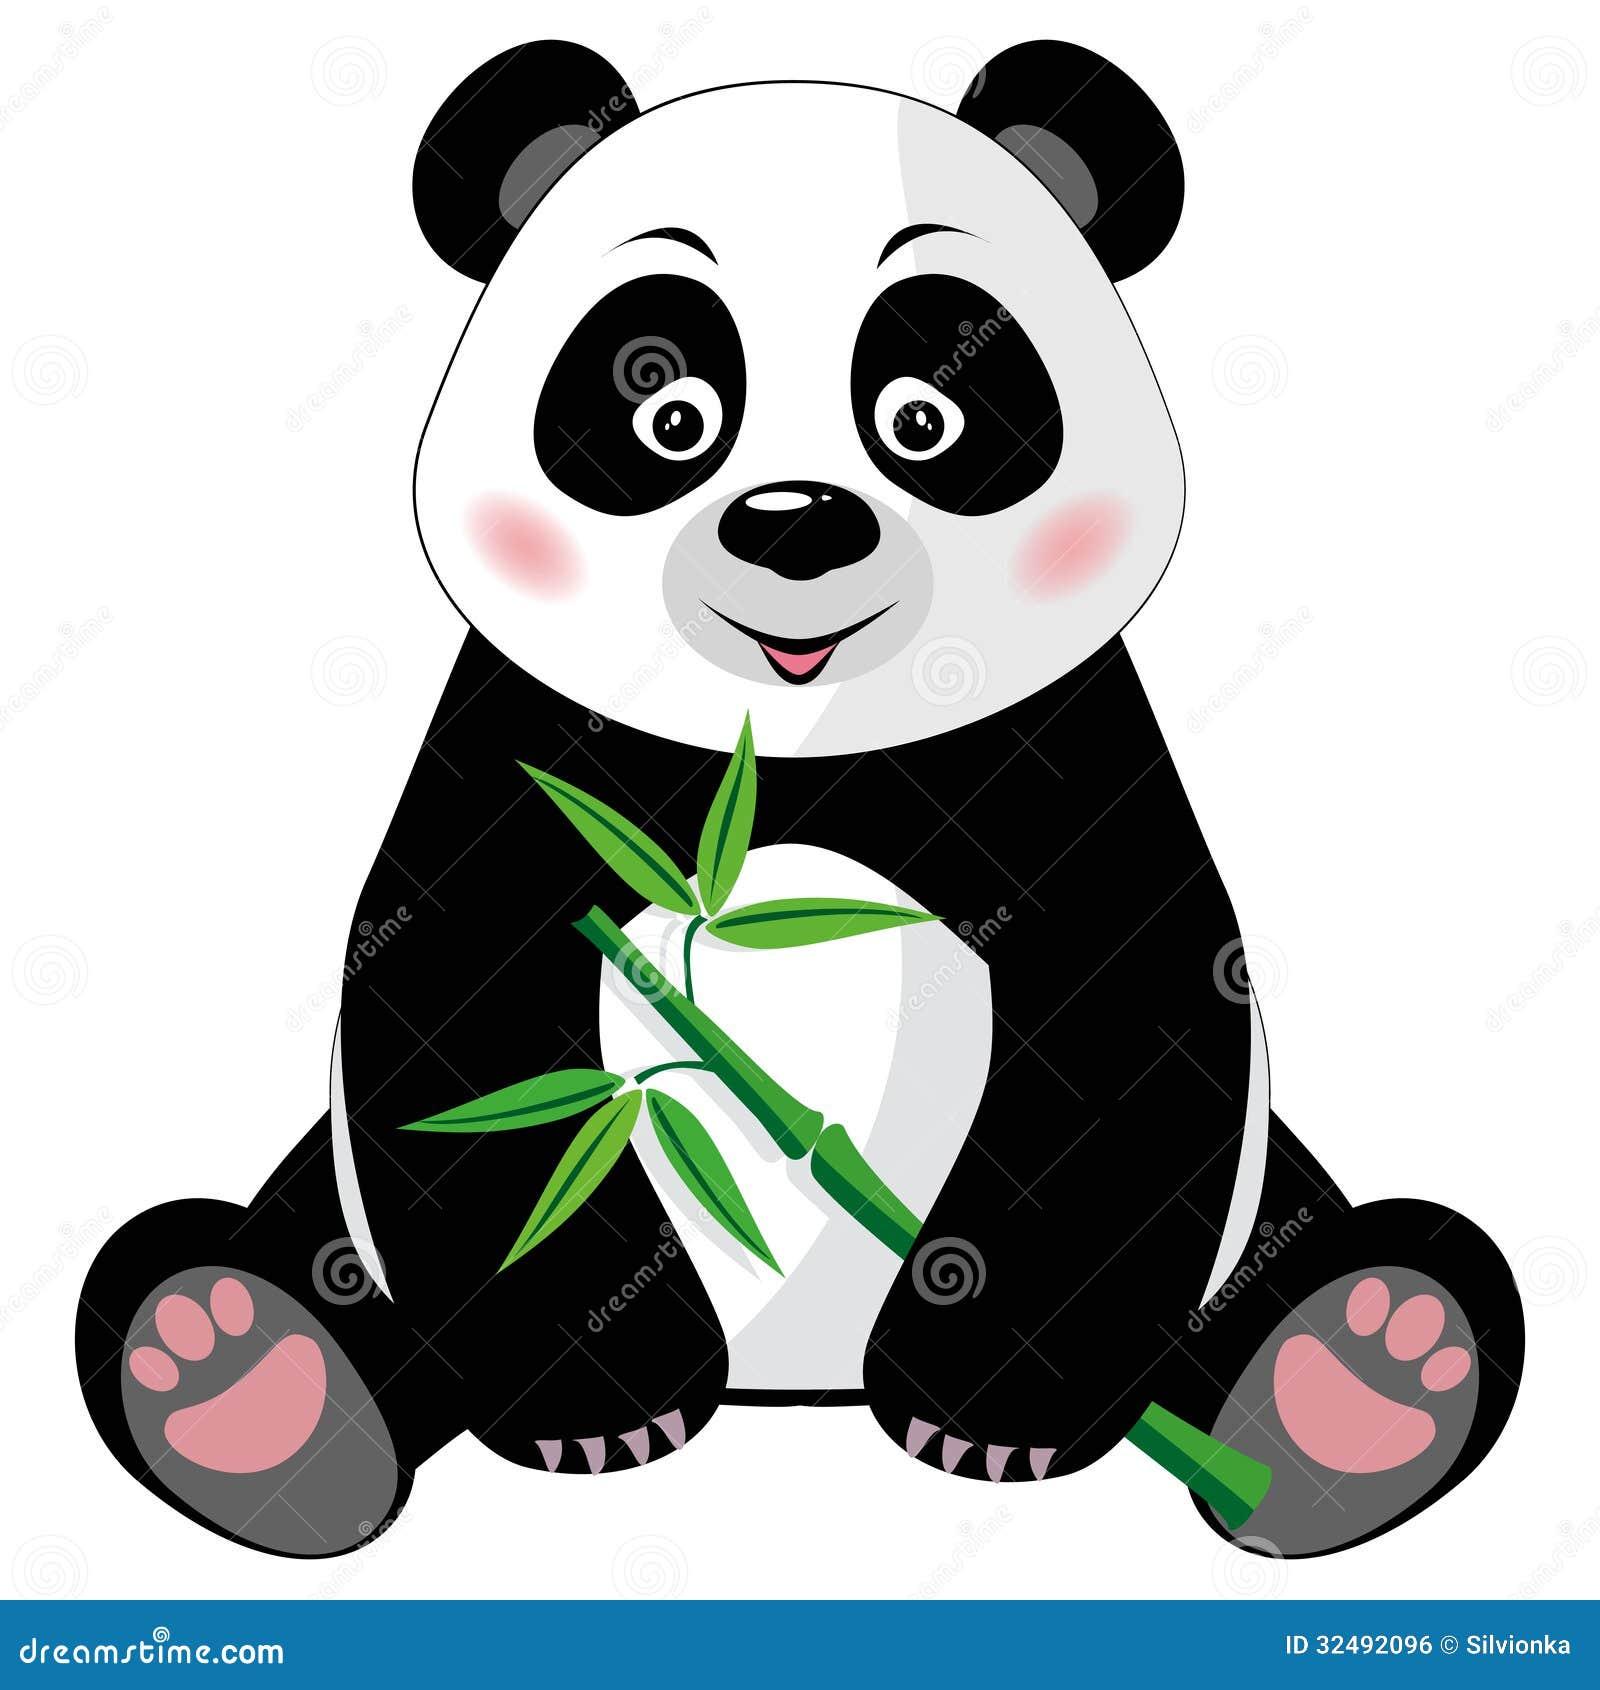 Sitting Cute Panda Wit...